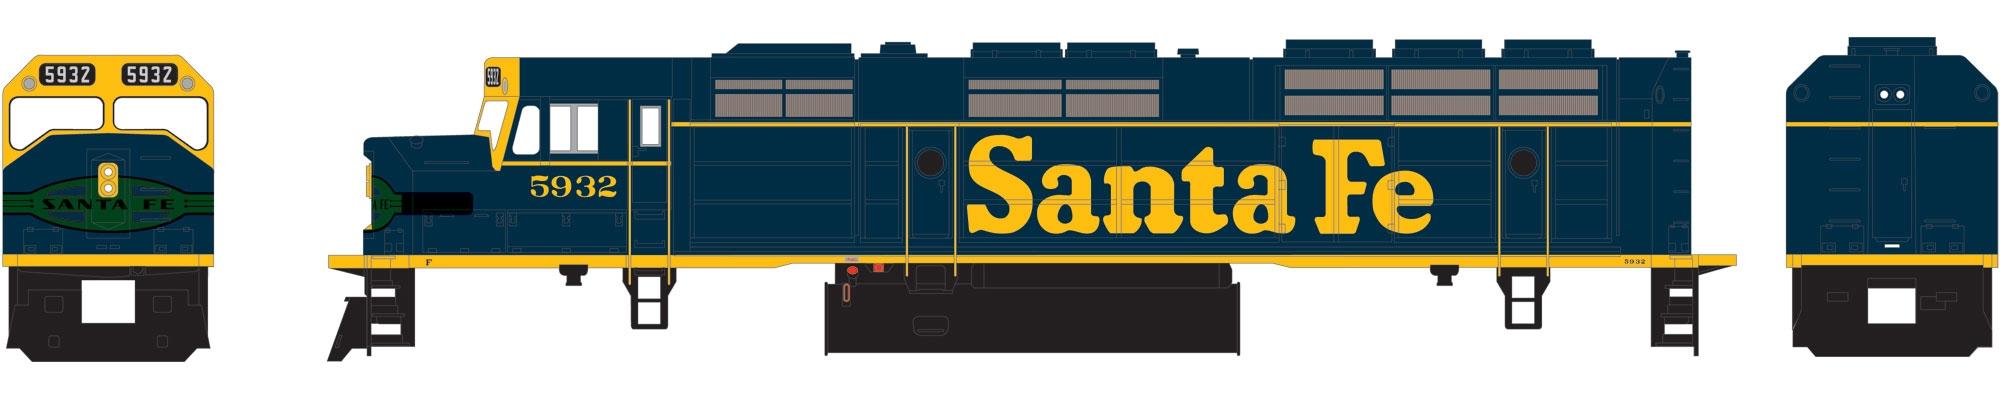 N Scale - Athearn - 22427 - Locomotive, Diesel, EMD F45 - Santa Fe - 5932